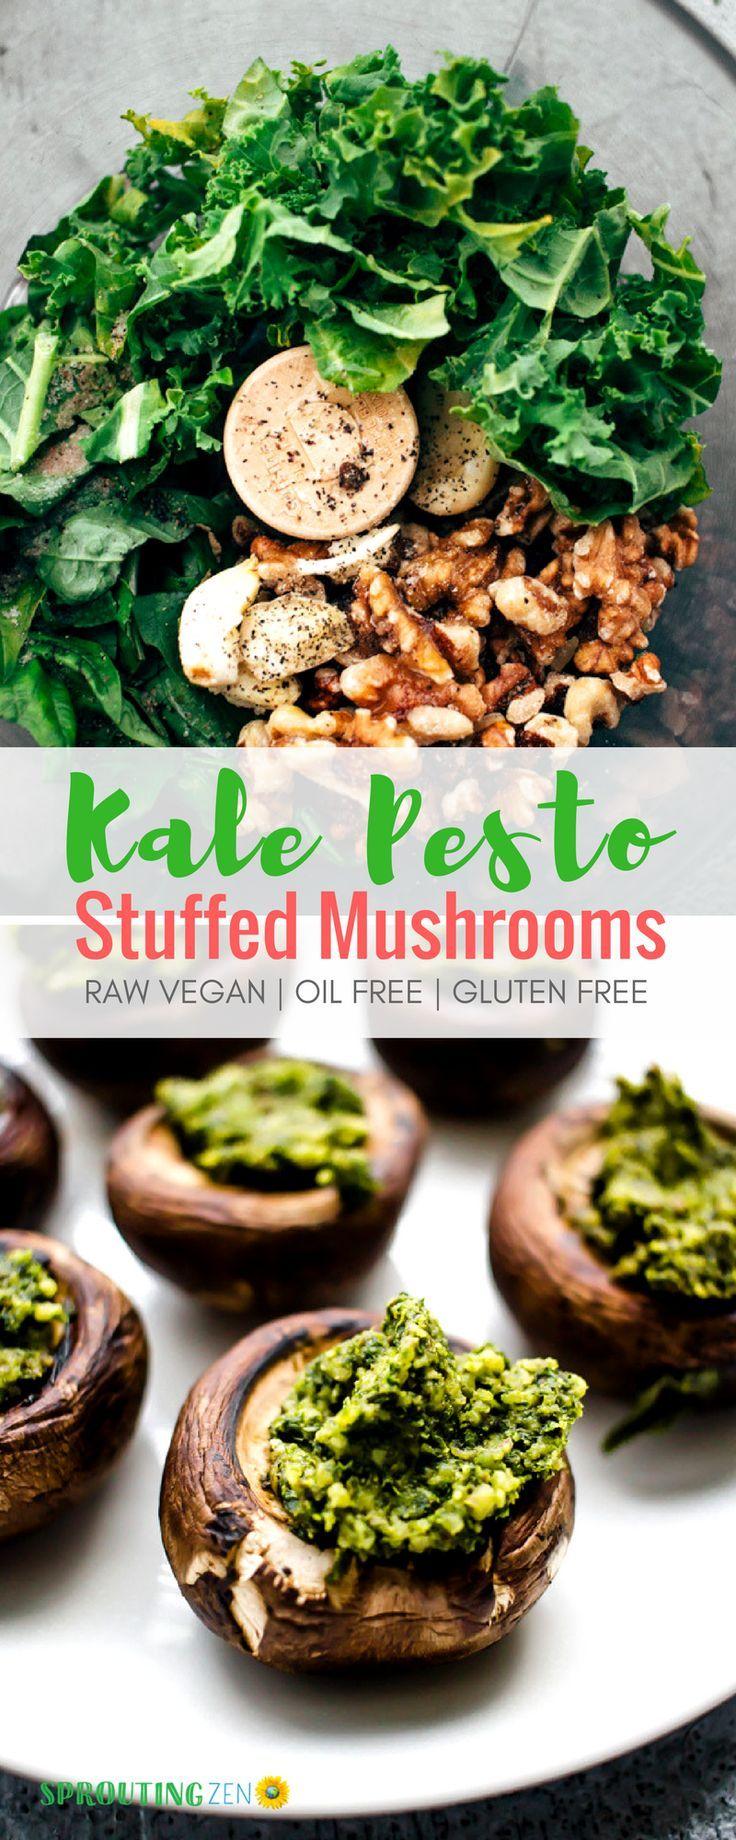 Oil Free Vegan Kale Pesto Stuffed Baby Mushrooms Sproutingzen Recipe Oil Free Vegan Recipes Oil Free Vegan Vegan Apps